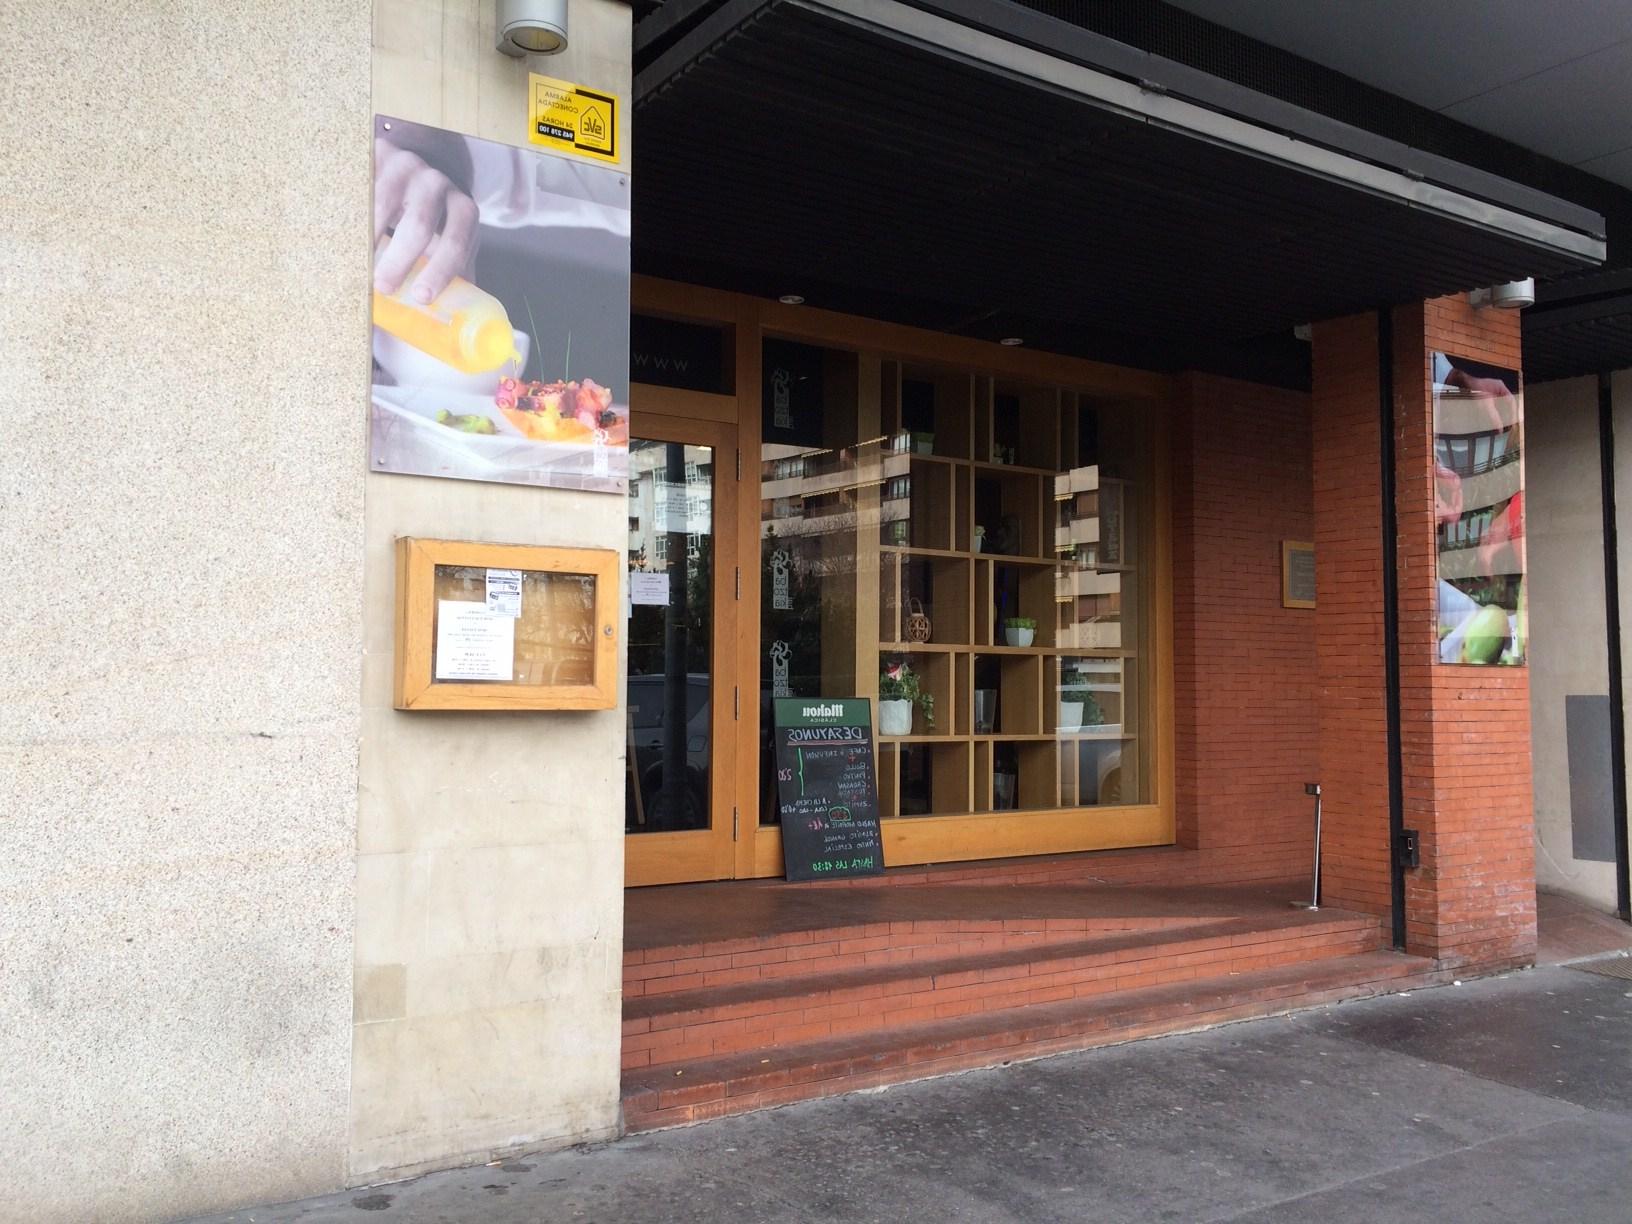 Restaurante Mesa Vitoria Ipdd Restaurante Mesa Vitoria Empreendedorismo De Trailer A Um Grande